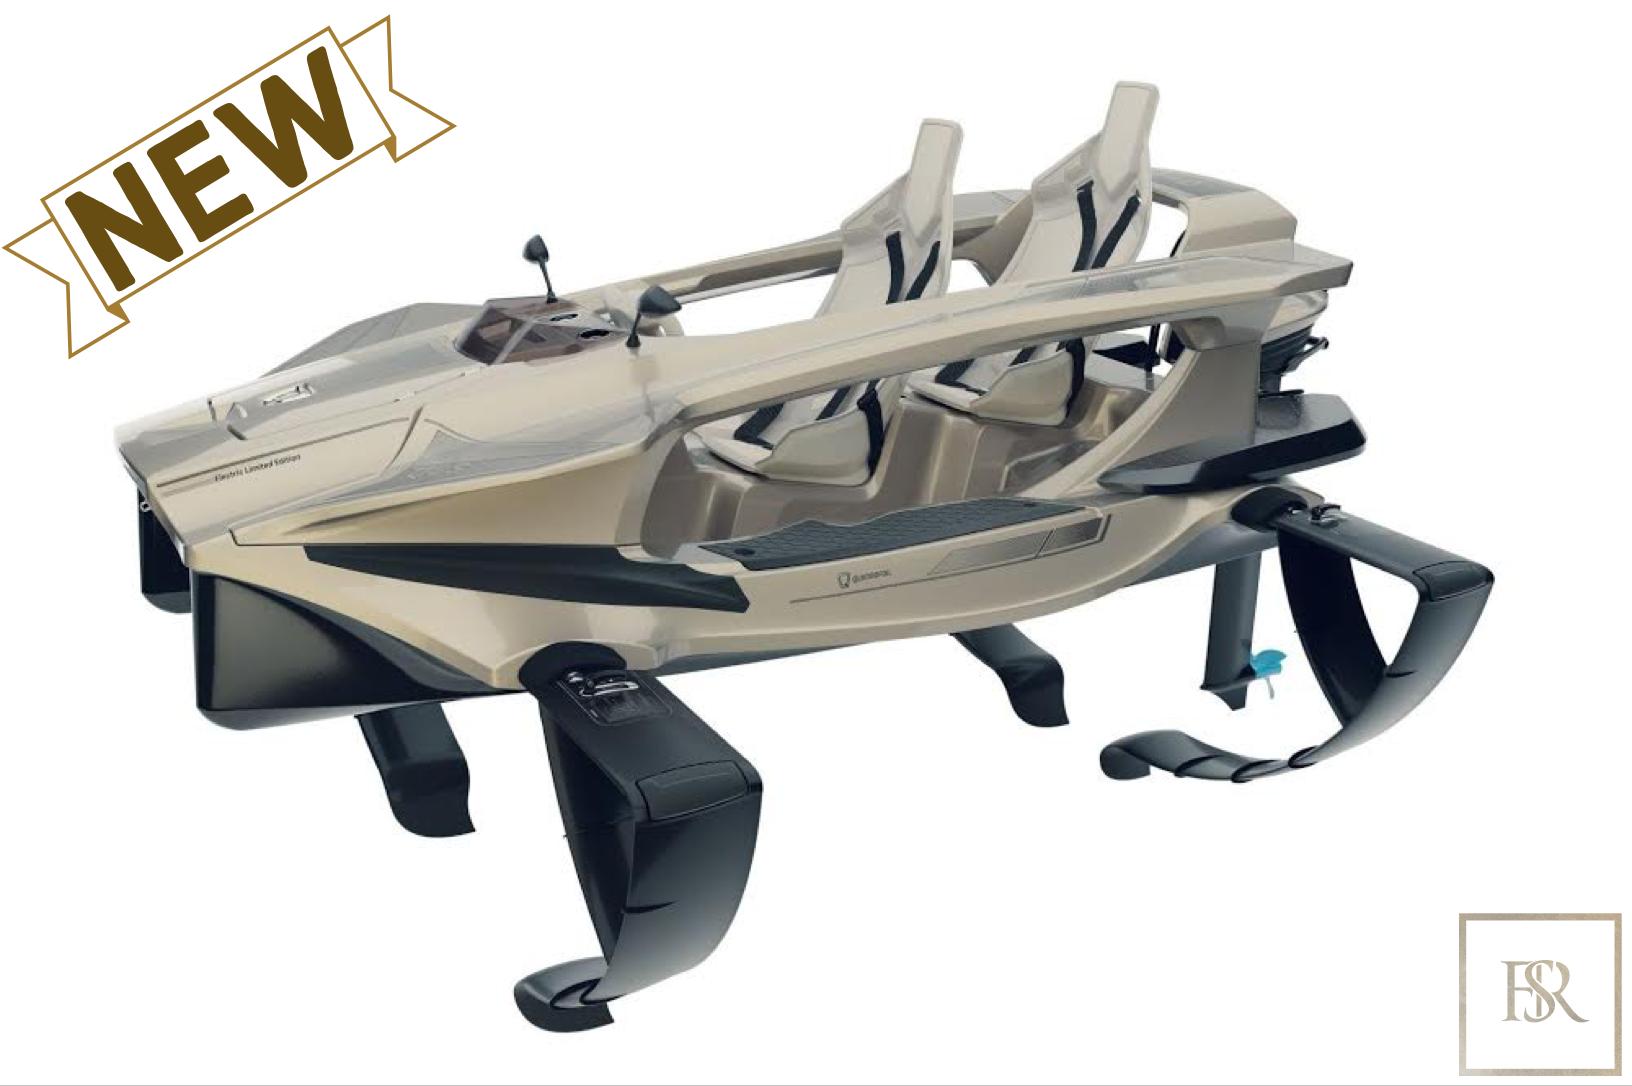 Electric boat - Quadrofoil Q2S Limited Edition for sale For Super Rich